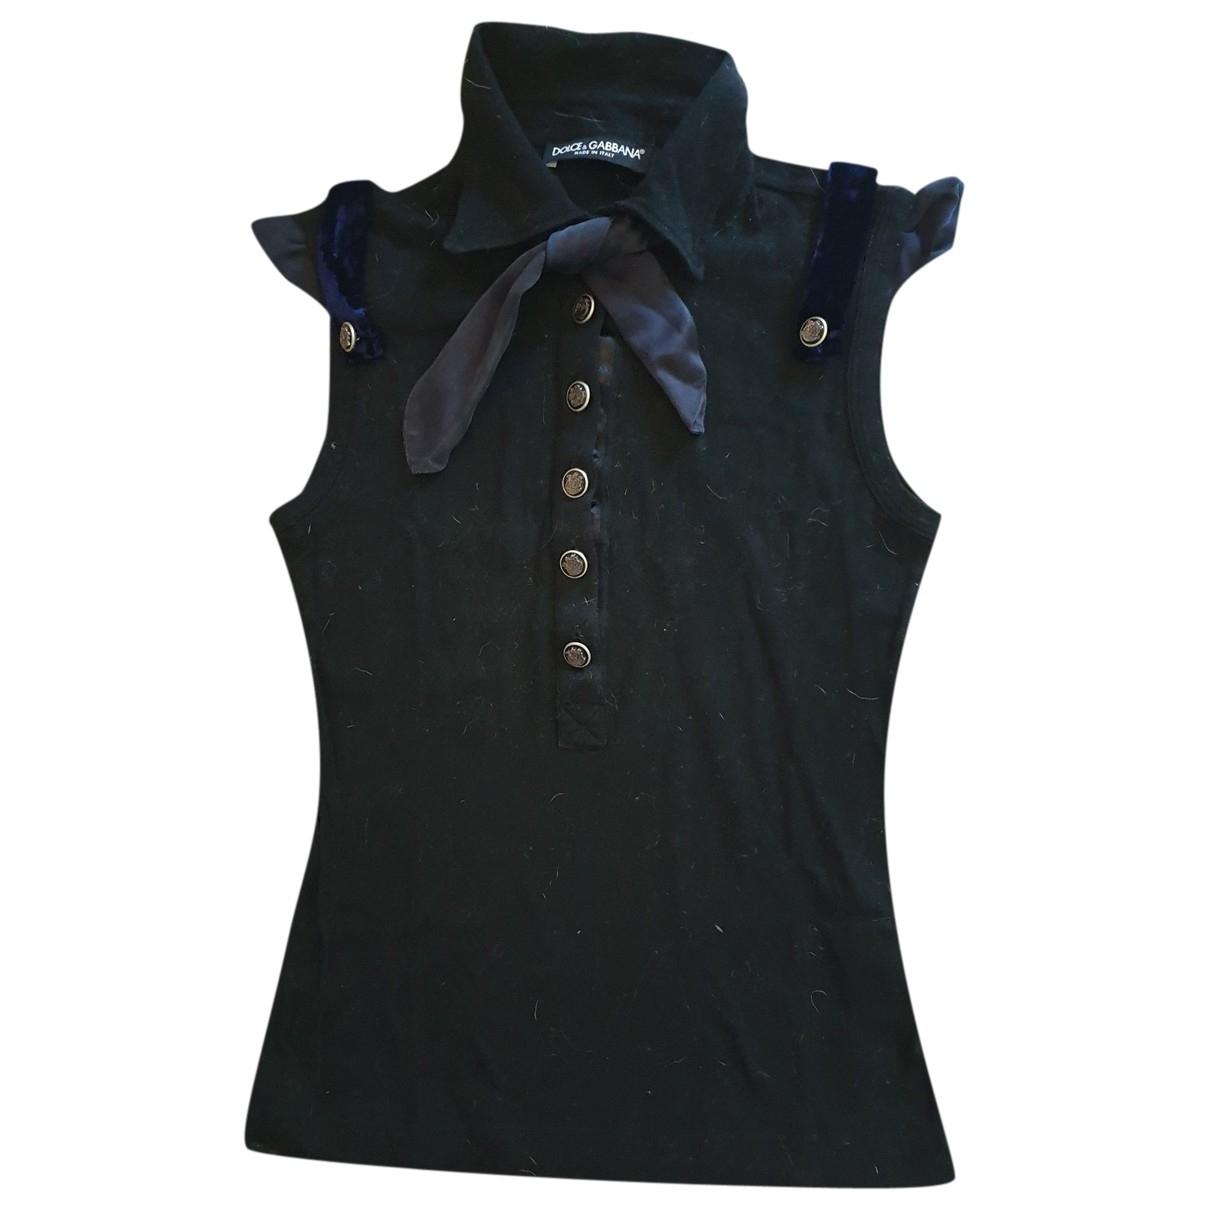 Dolce & Gabbana \N Blue  top for Women 34 FR